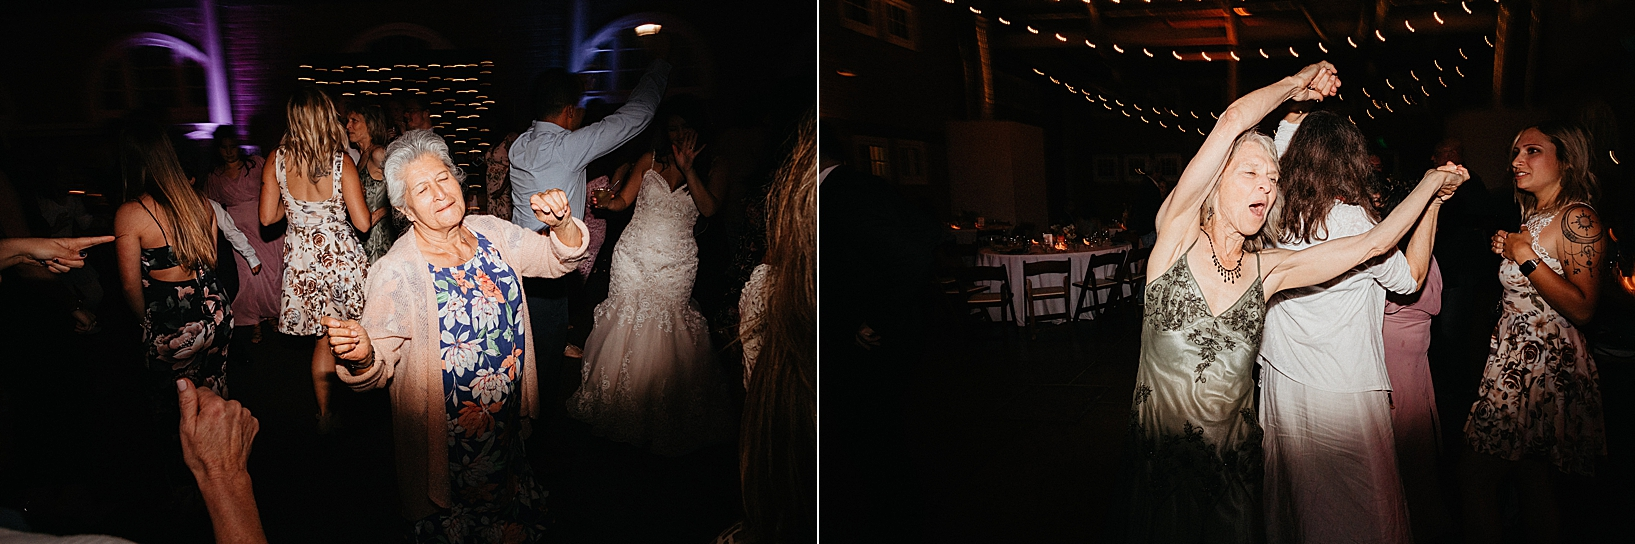 Harbor-Island-Brick-Wedding-100.jpg